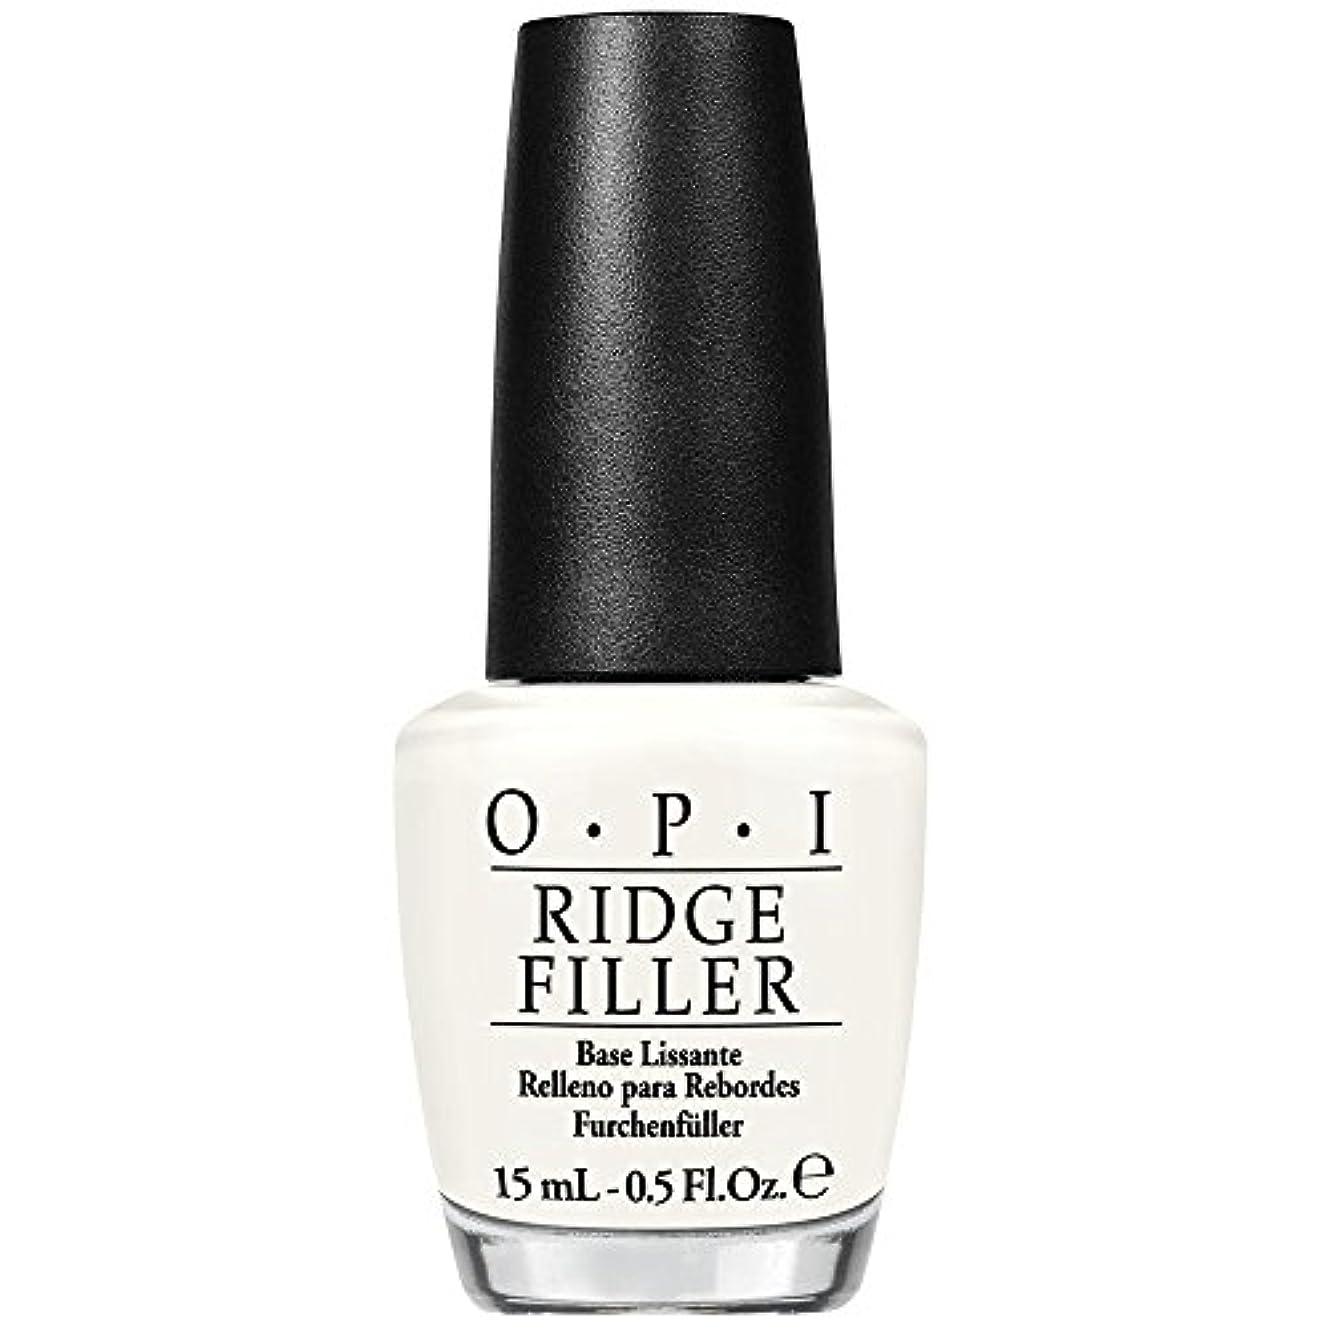 OPI(オーピーアイ) リッジフィラー